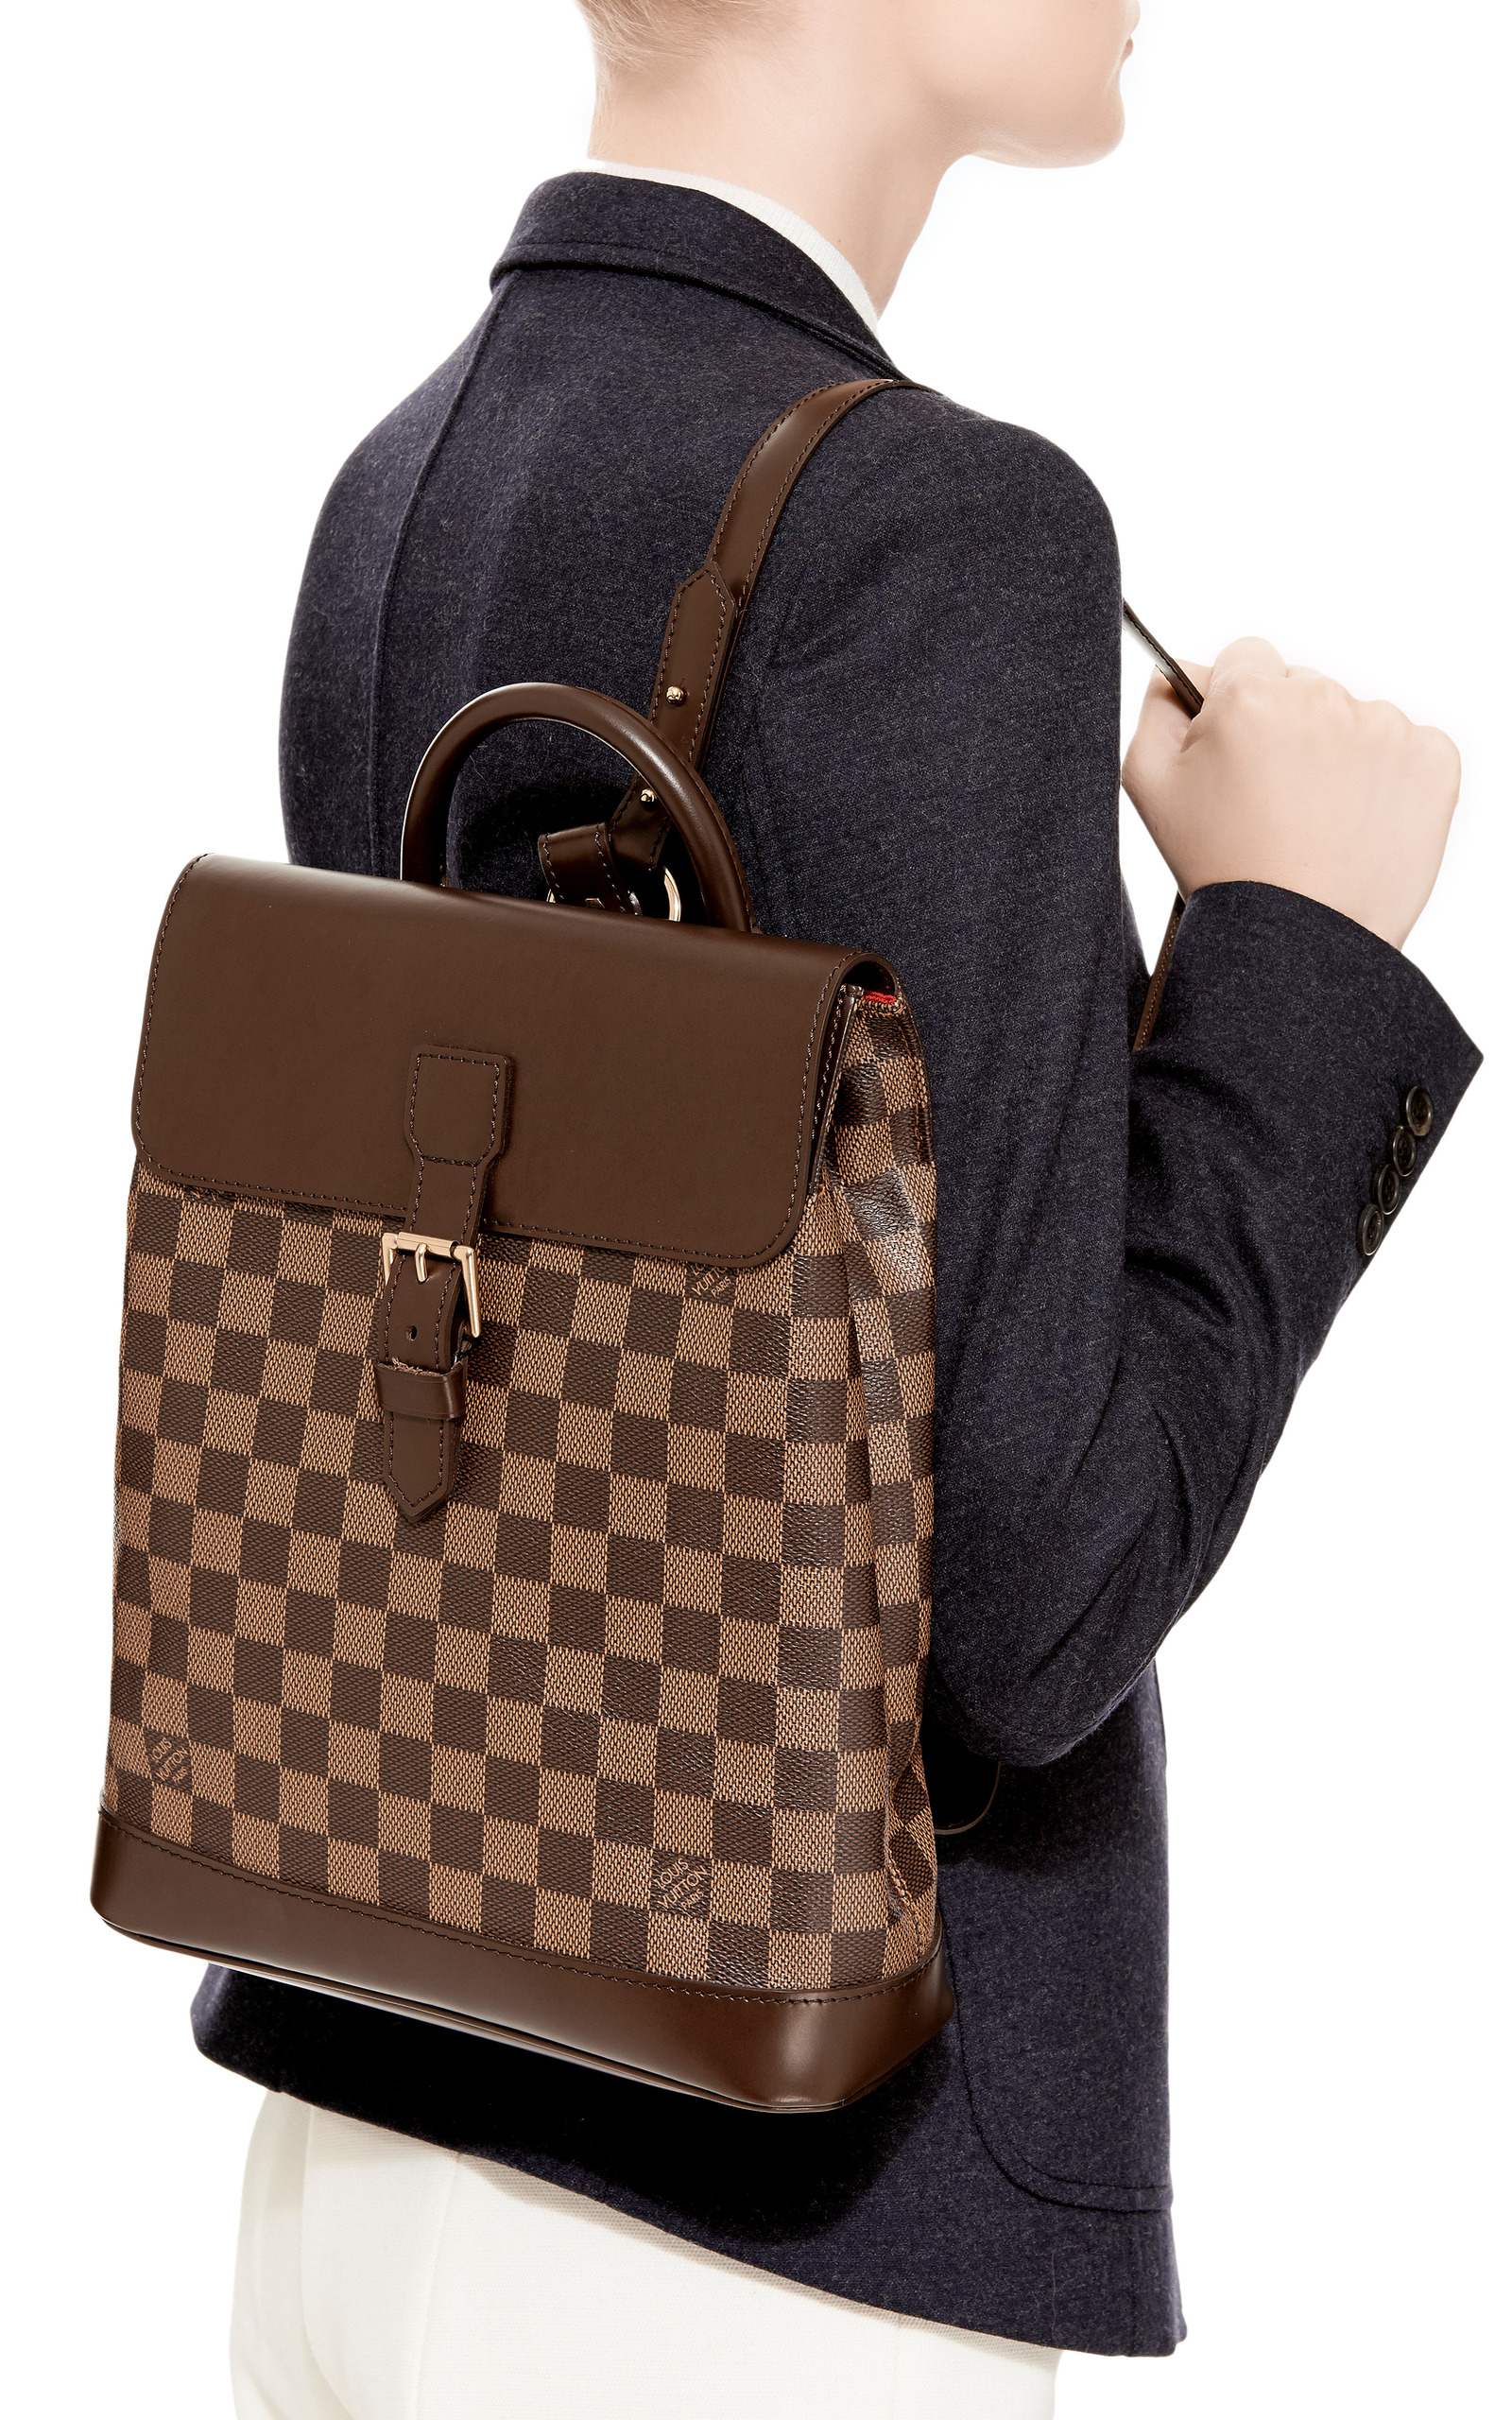 Vintage Louis Vuitton Damier Ebene Soho Backpack By Moda